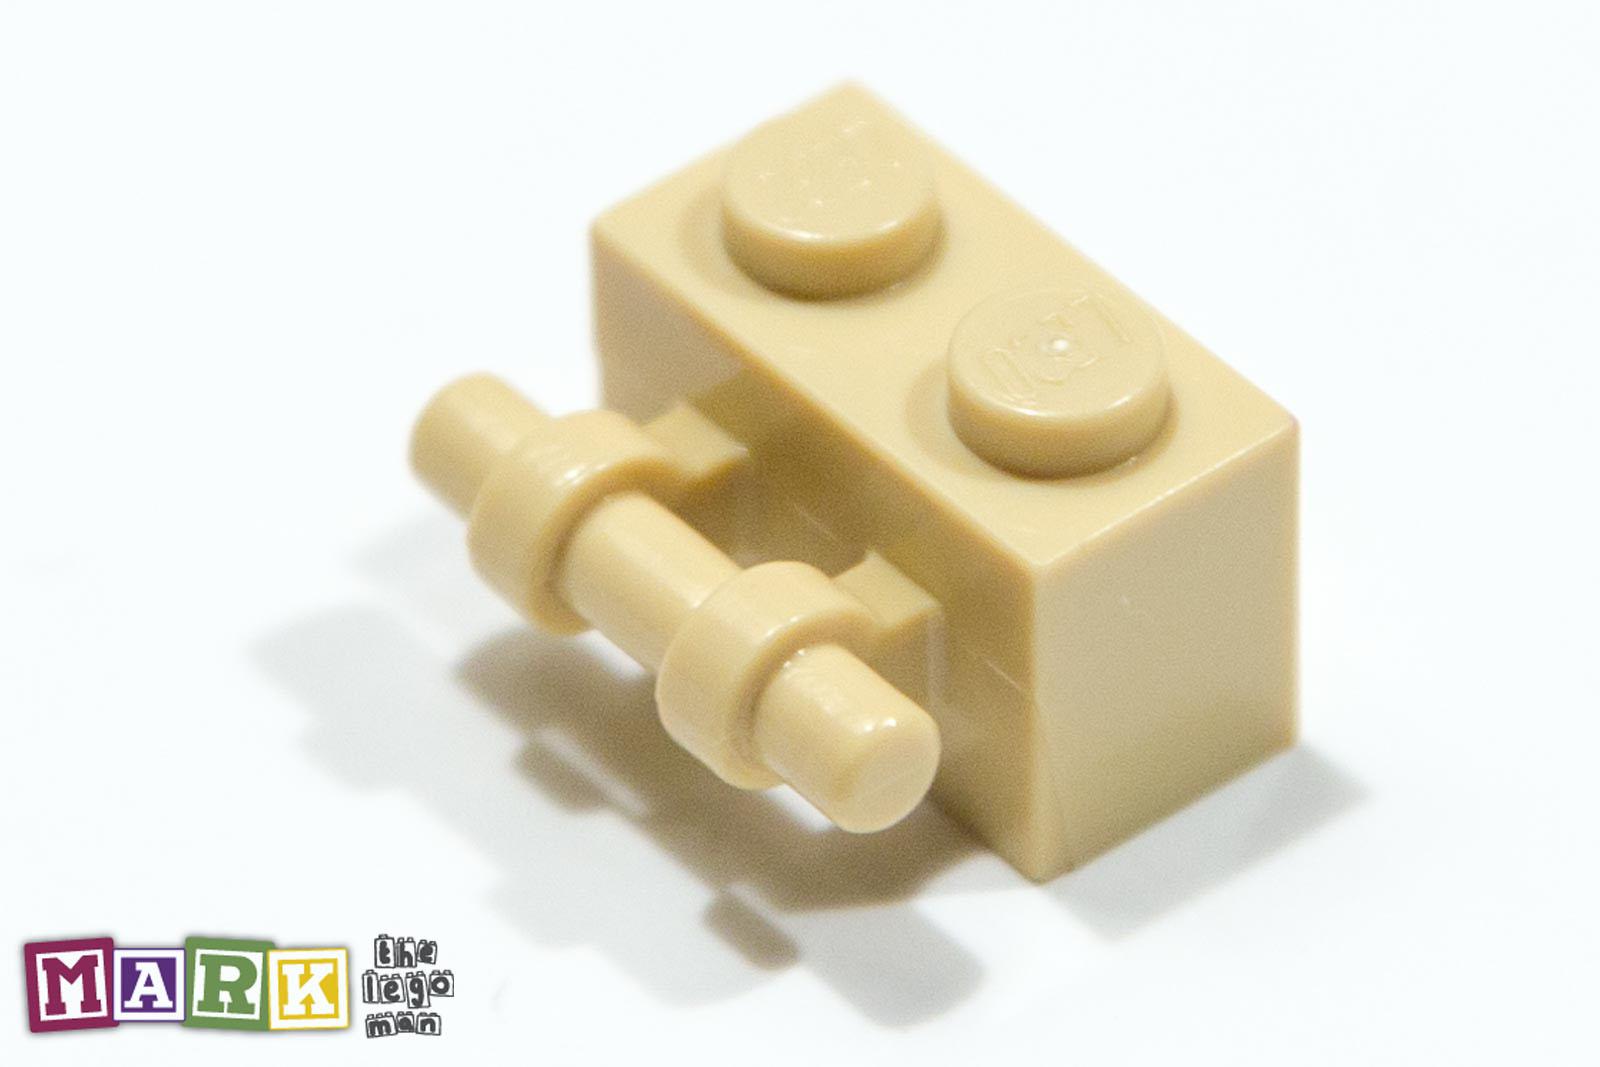 Lego 4288513 30236 Brick Yellow (Tan) 1x2 Brick With Stick Handle